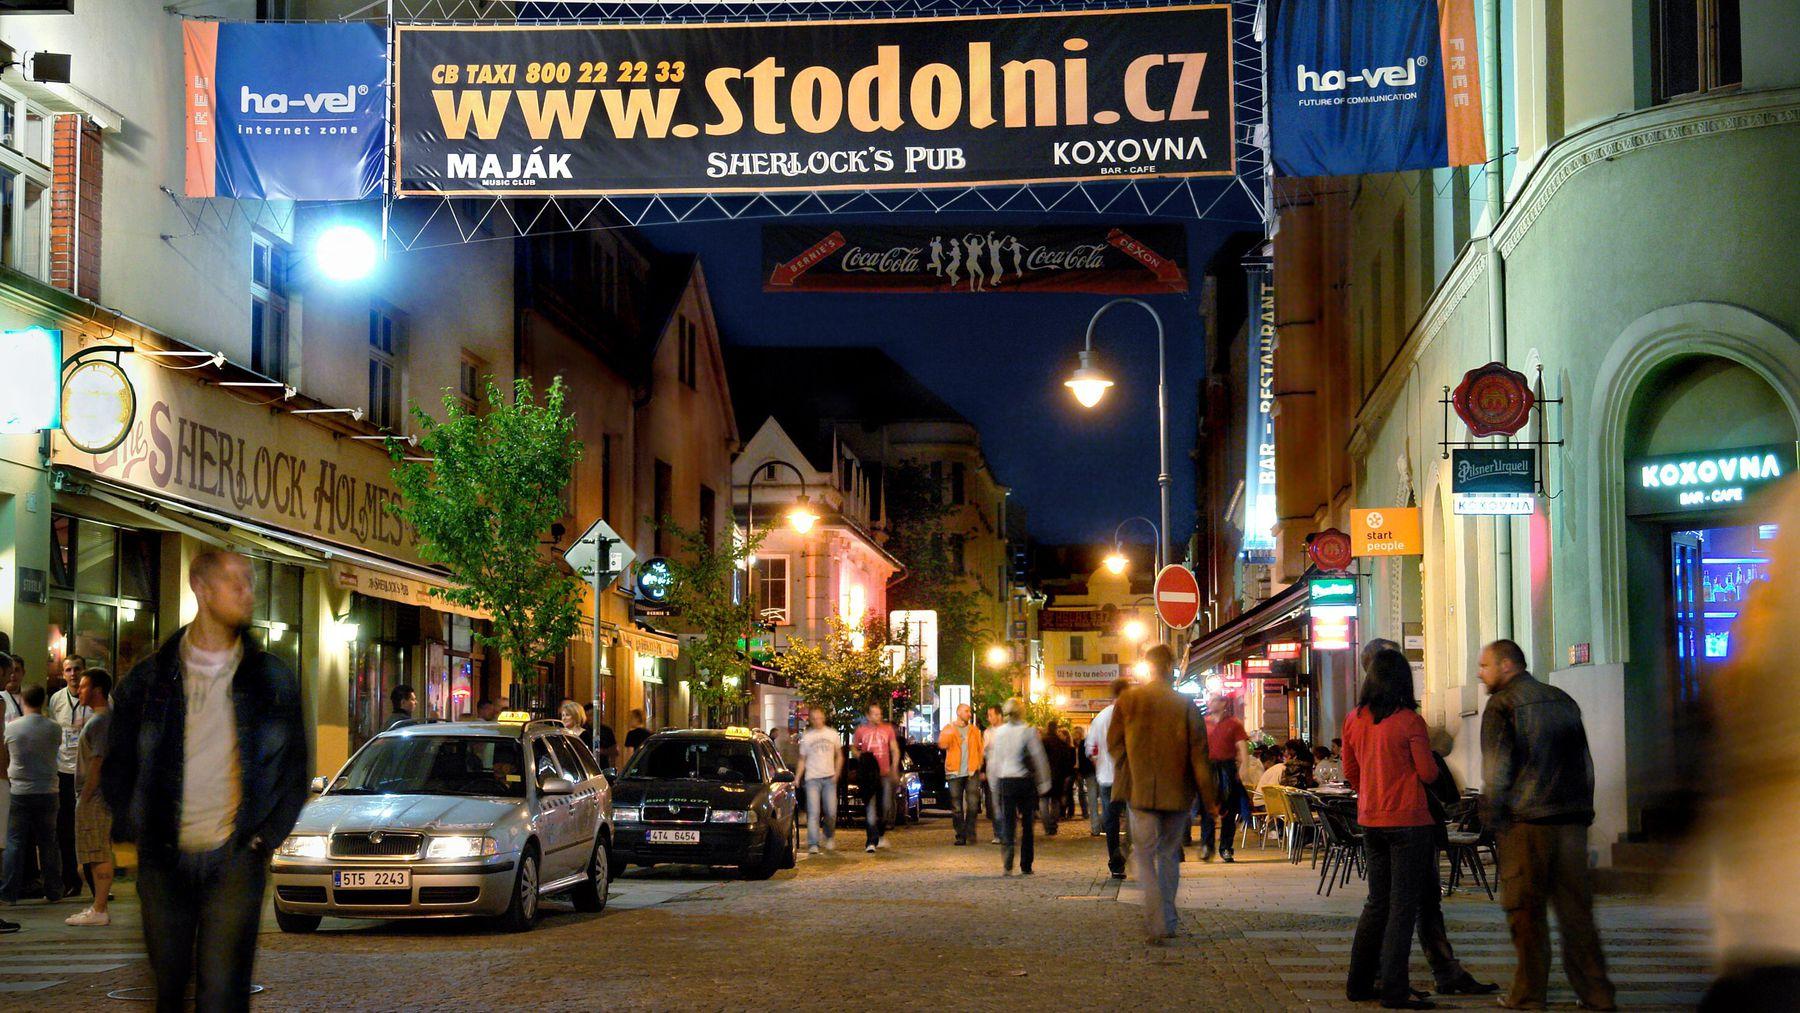 rencontres Ostrava libre Inscrivez-vous sites de rencontre